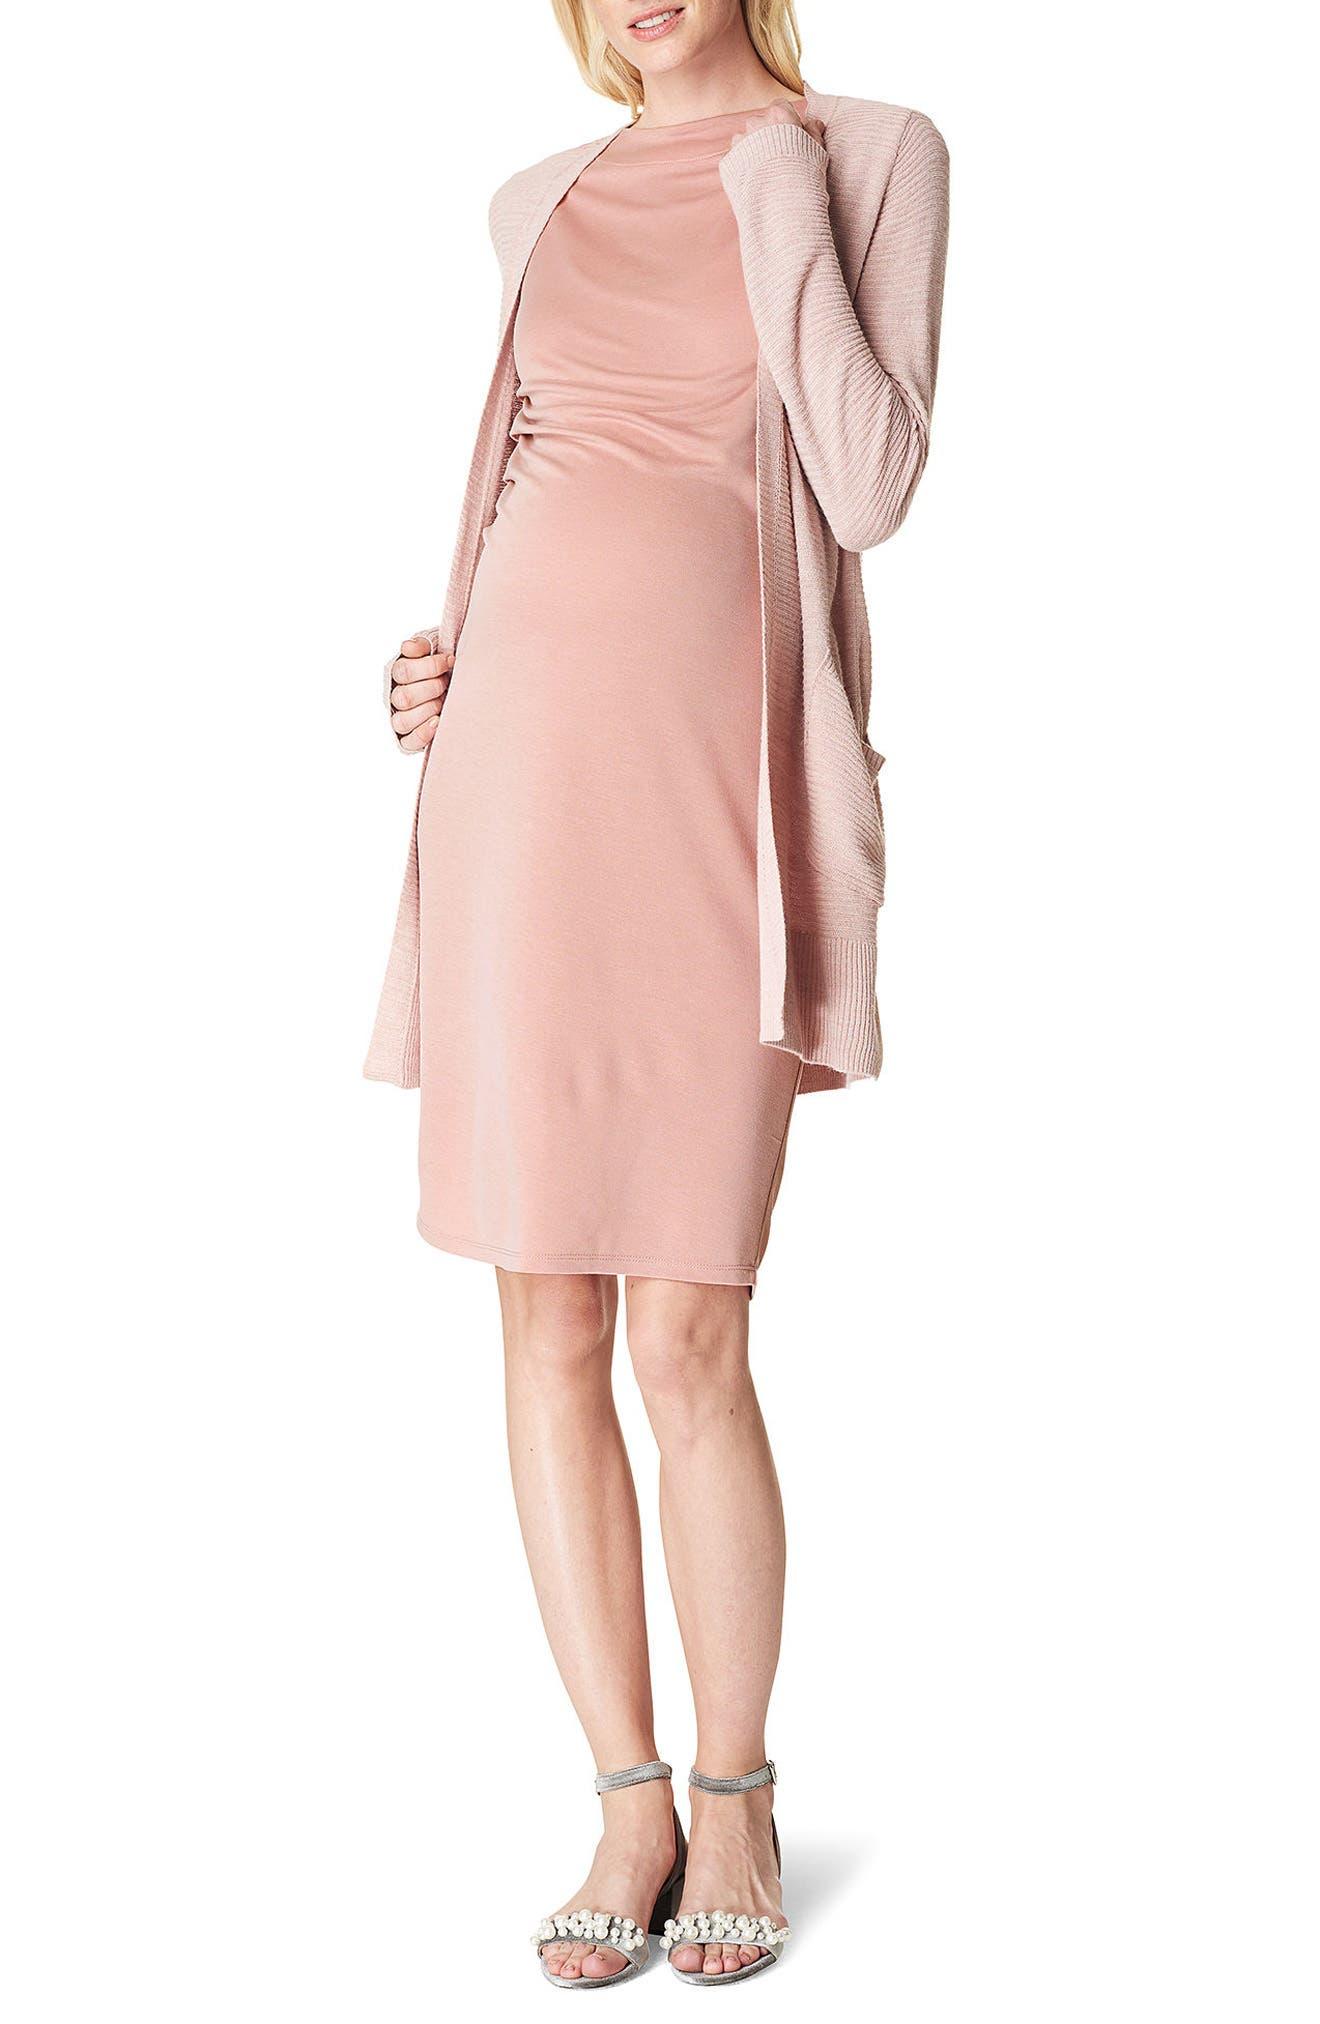 Noppies Annefleur Maternity Sheath Dress